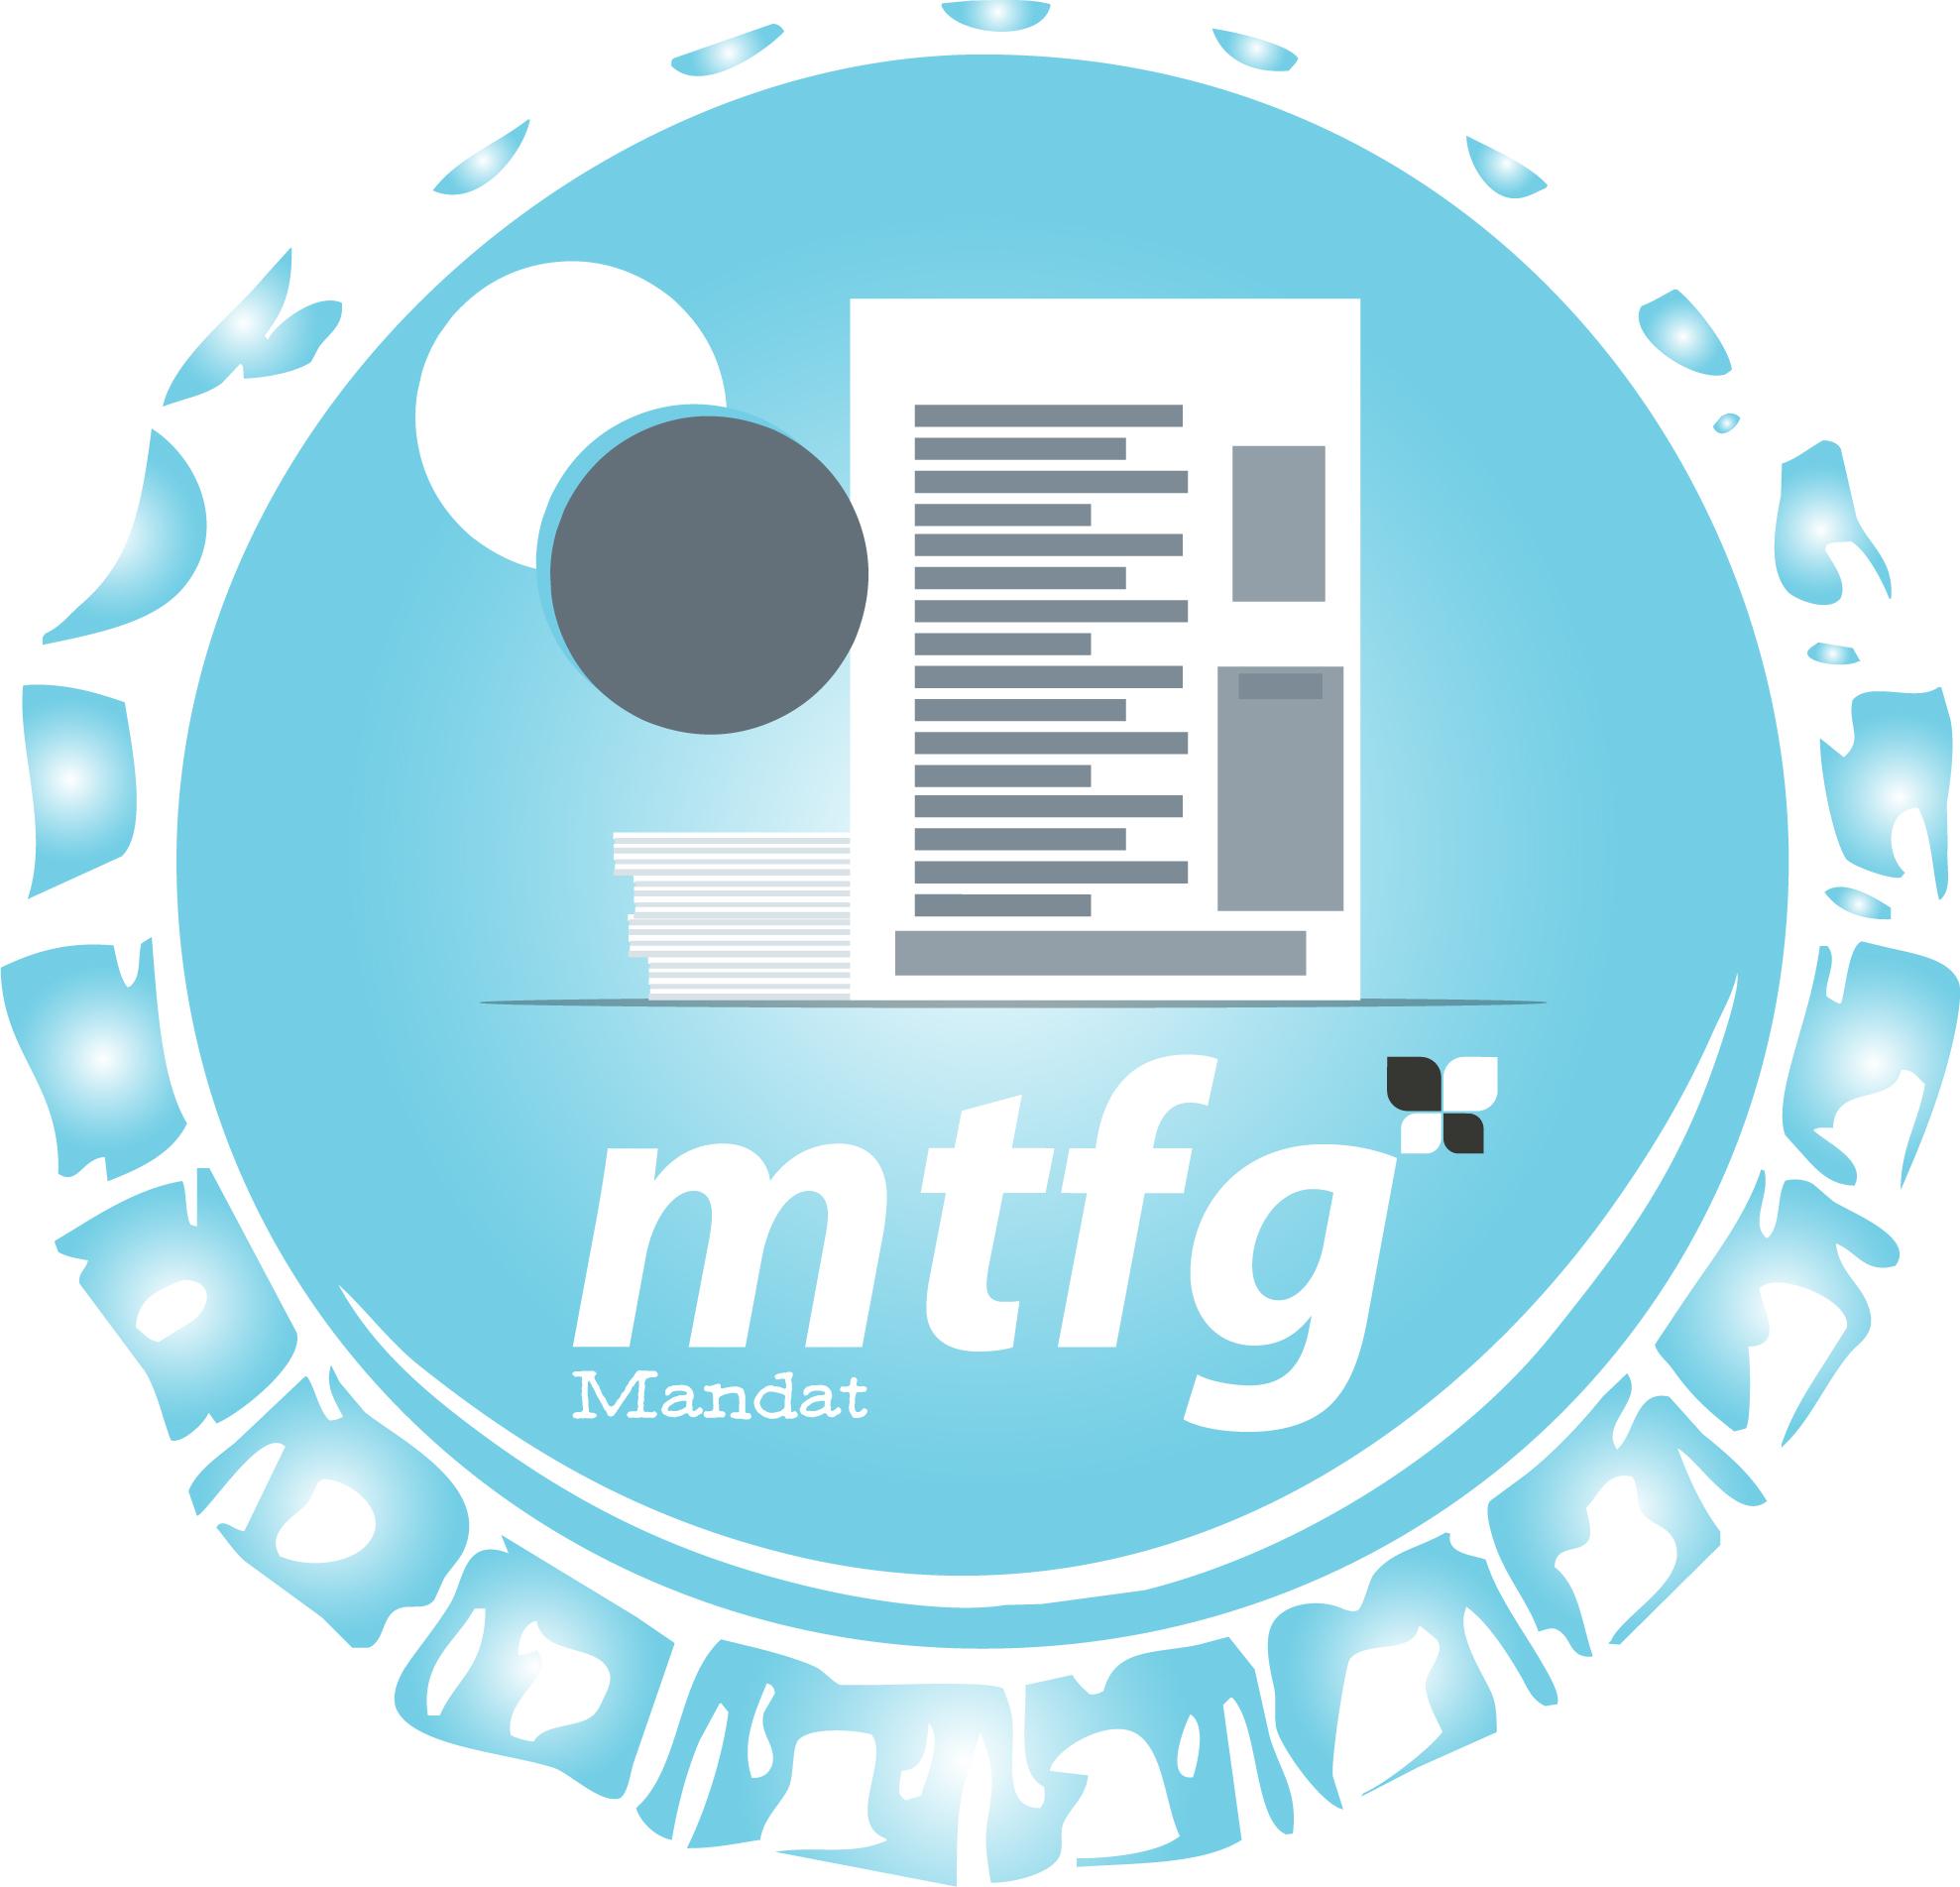 MTFG Mandat